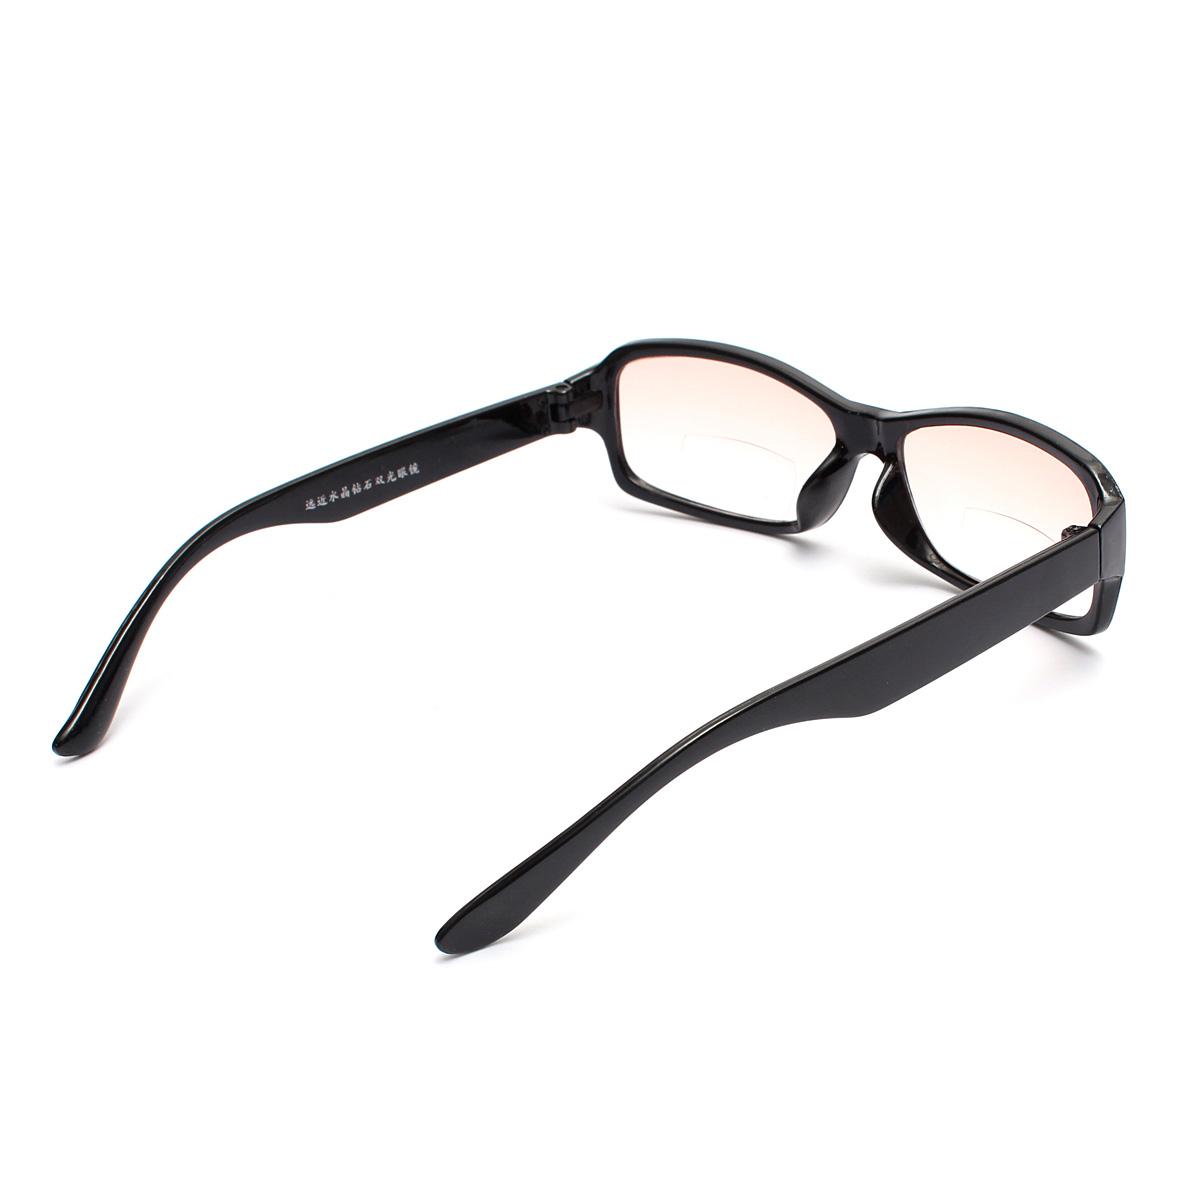 dual function bifocal reading glasses black unisex